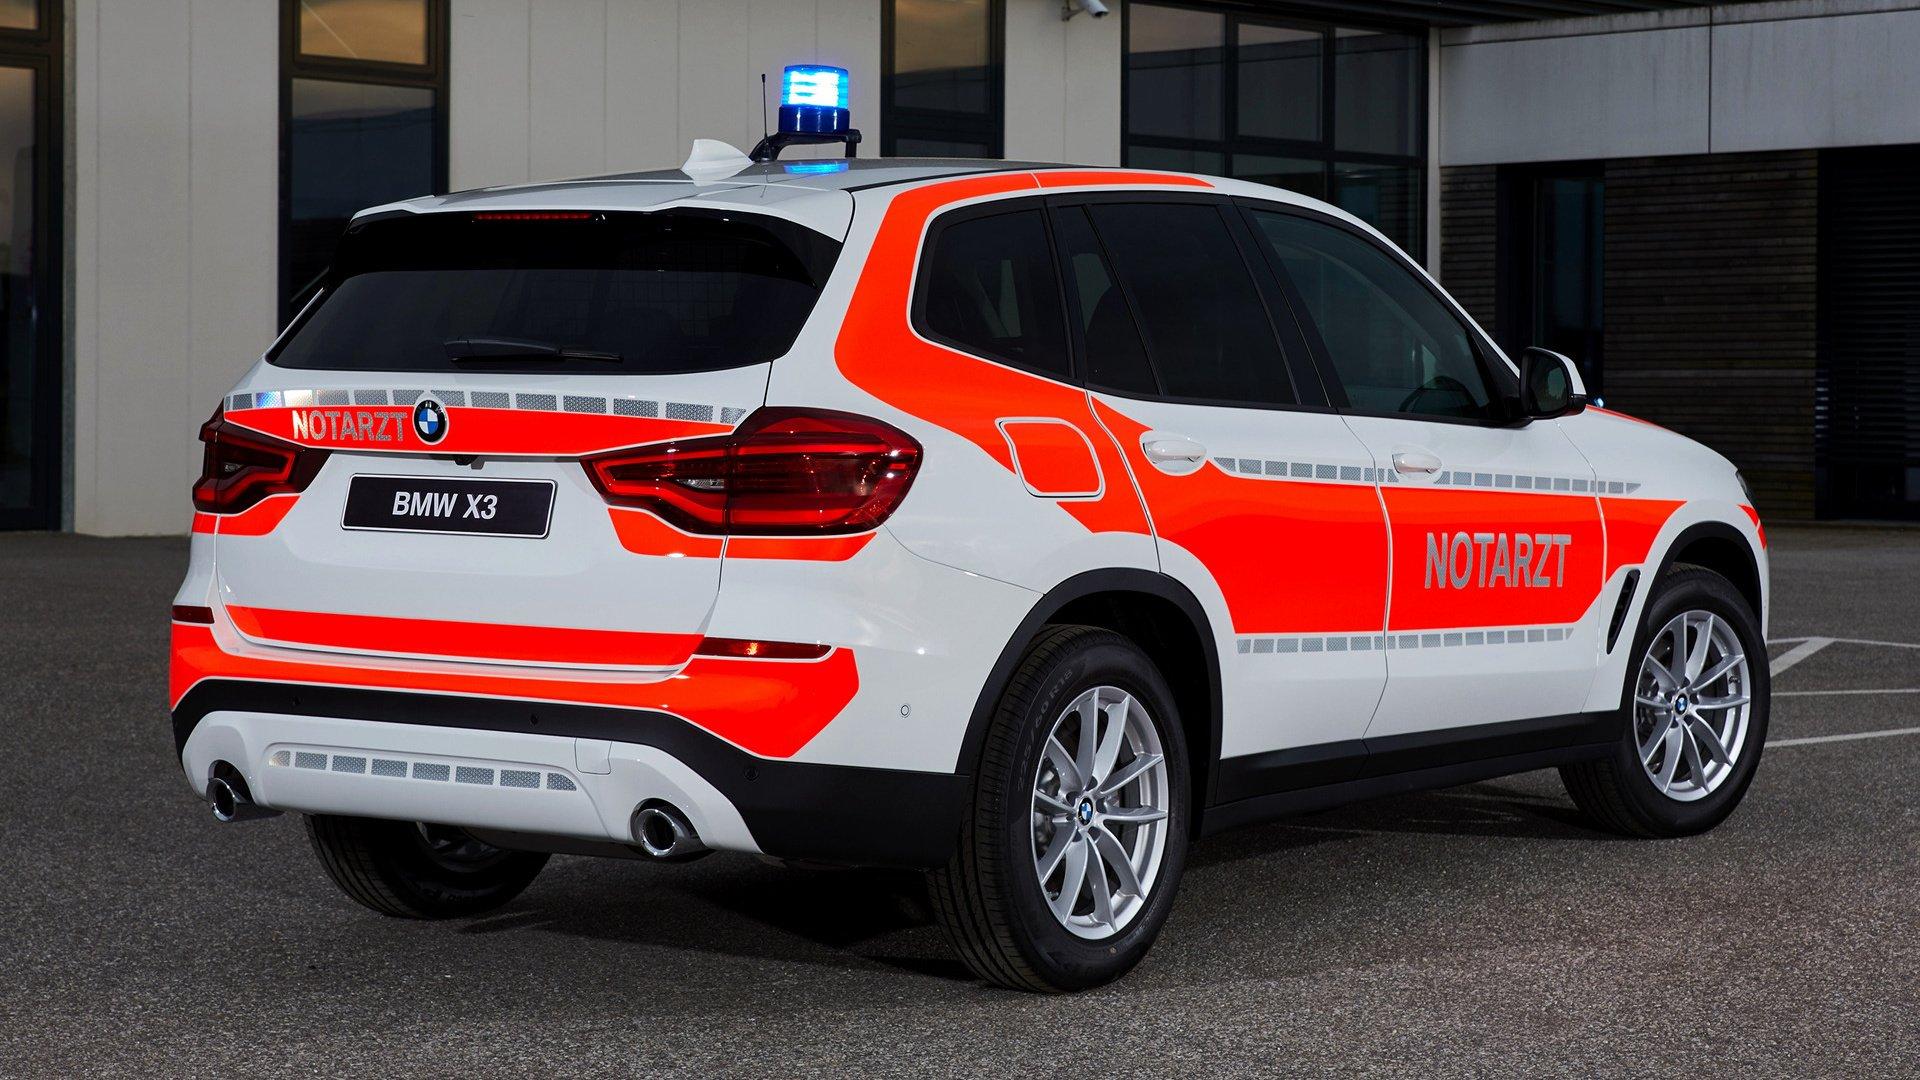 2018 BMW X3 Notarzt HD Wallpaper | Background Image ...